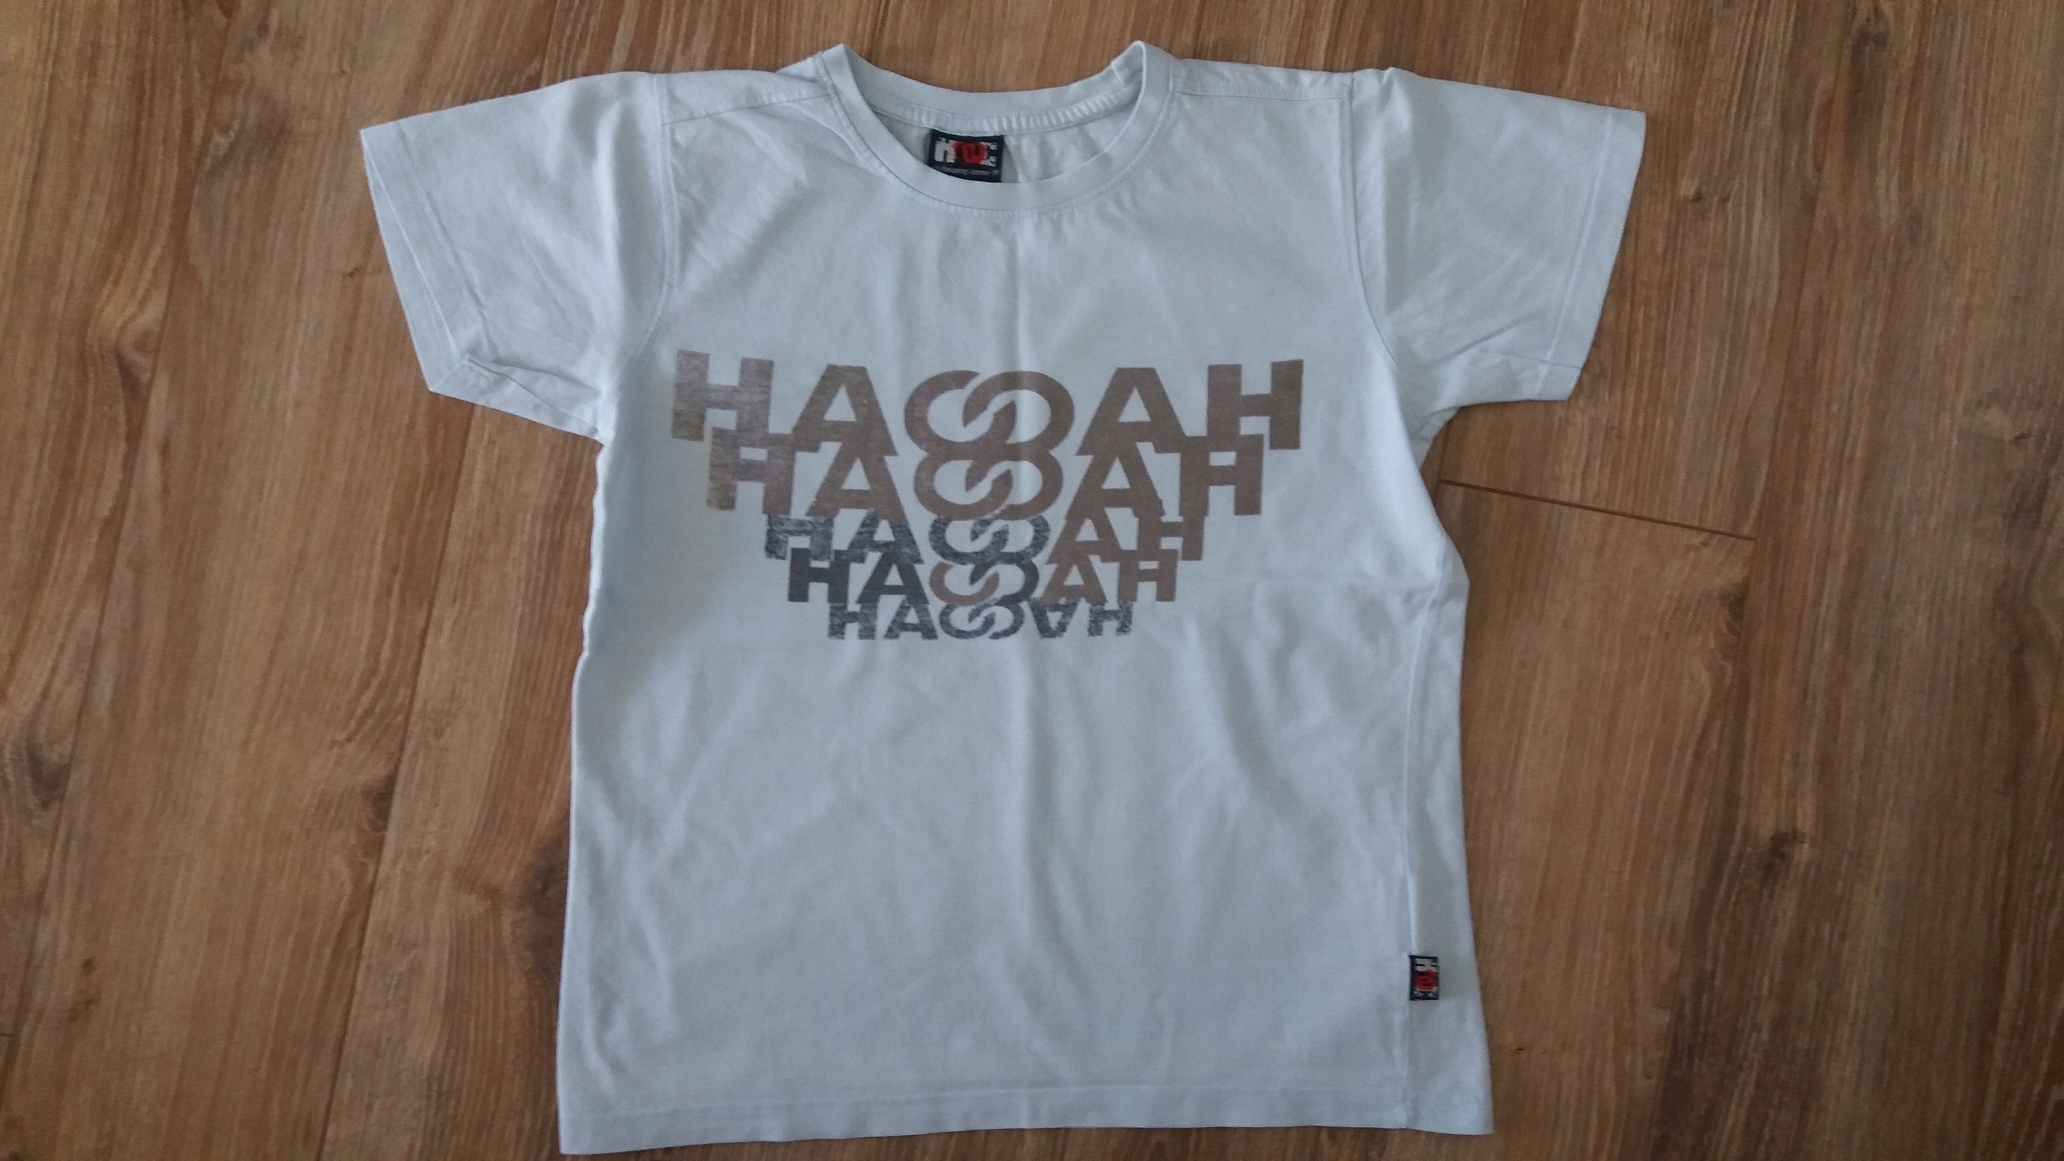 COCCODRILLO T-shirt dla chłopca r. 152